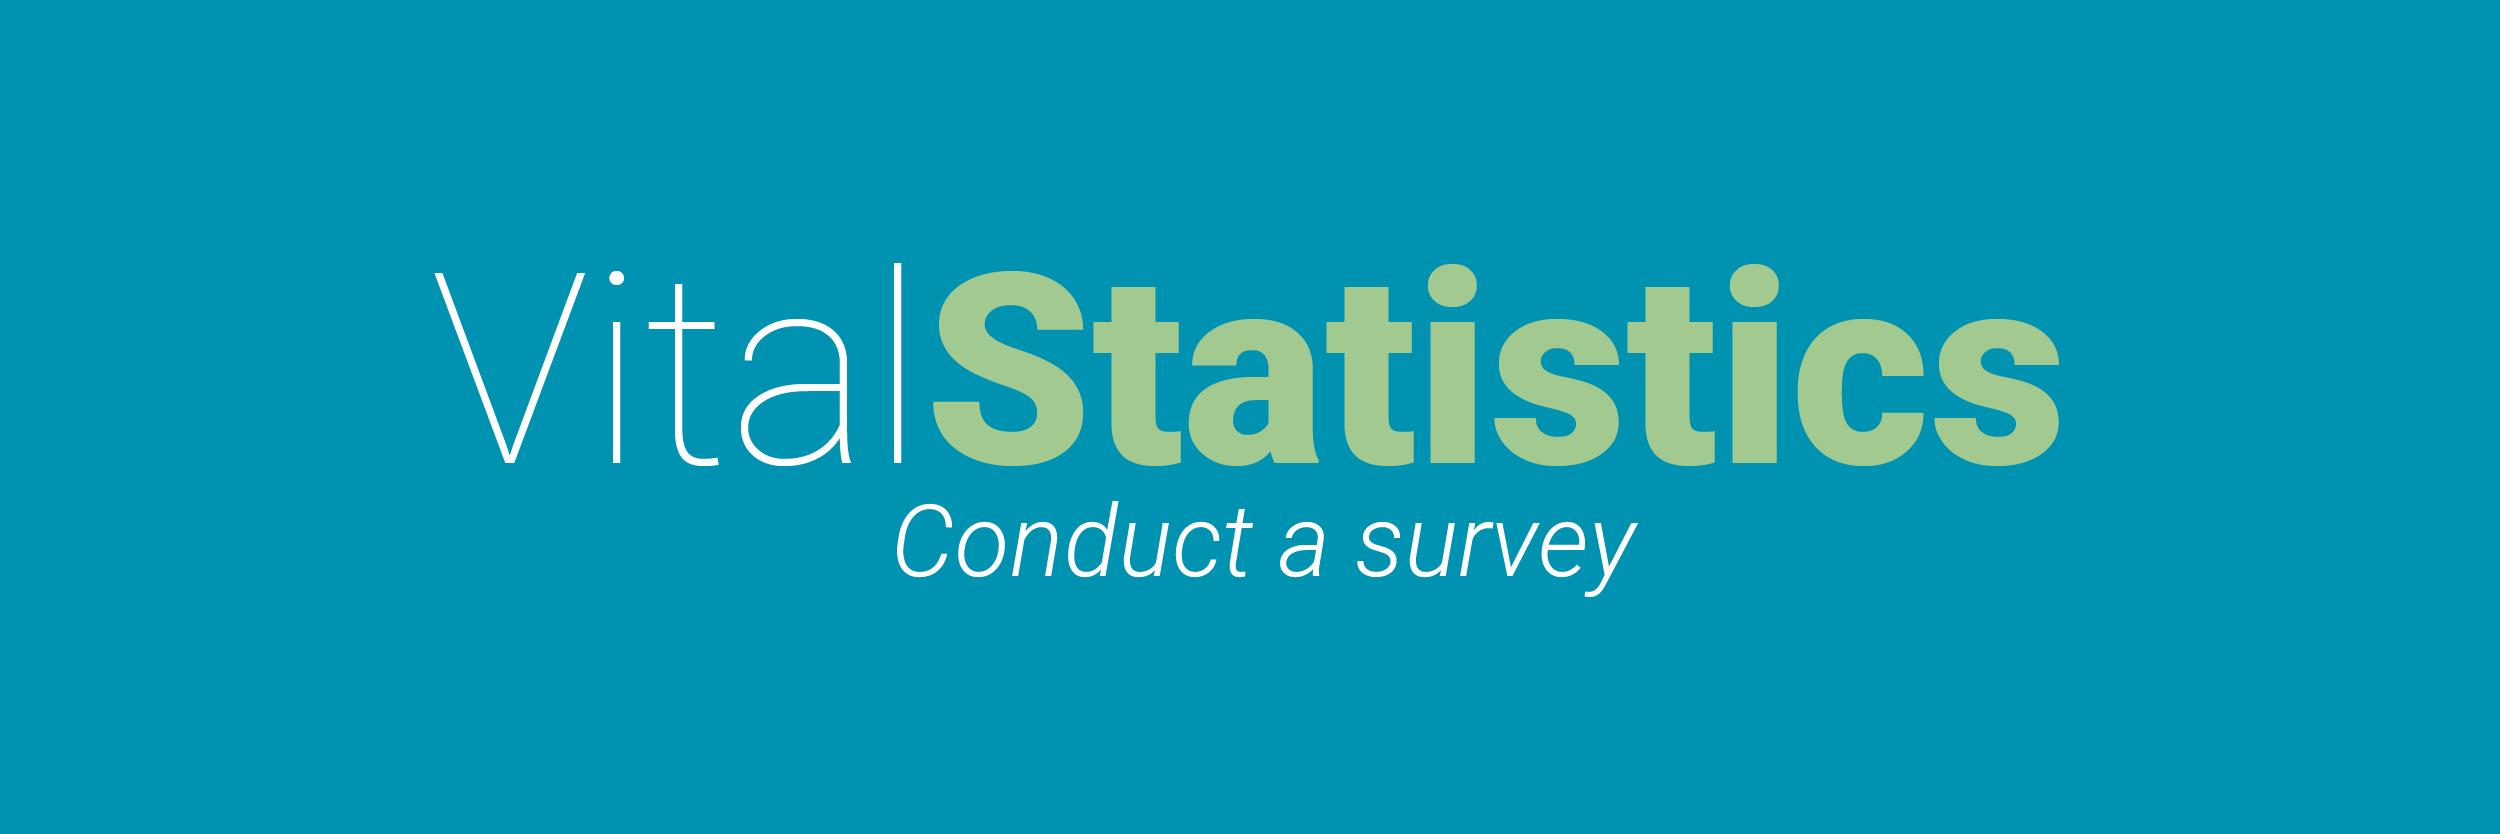 Vital Statistics-01-1